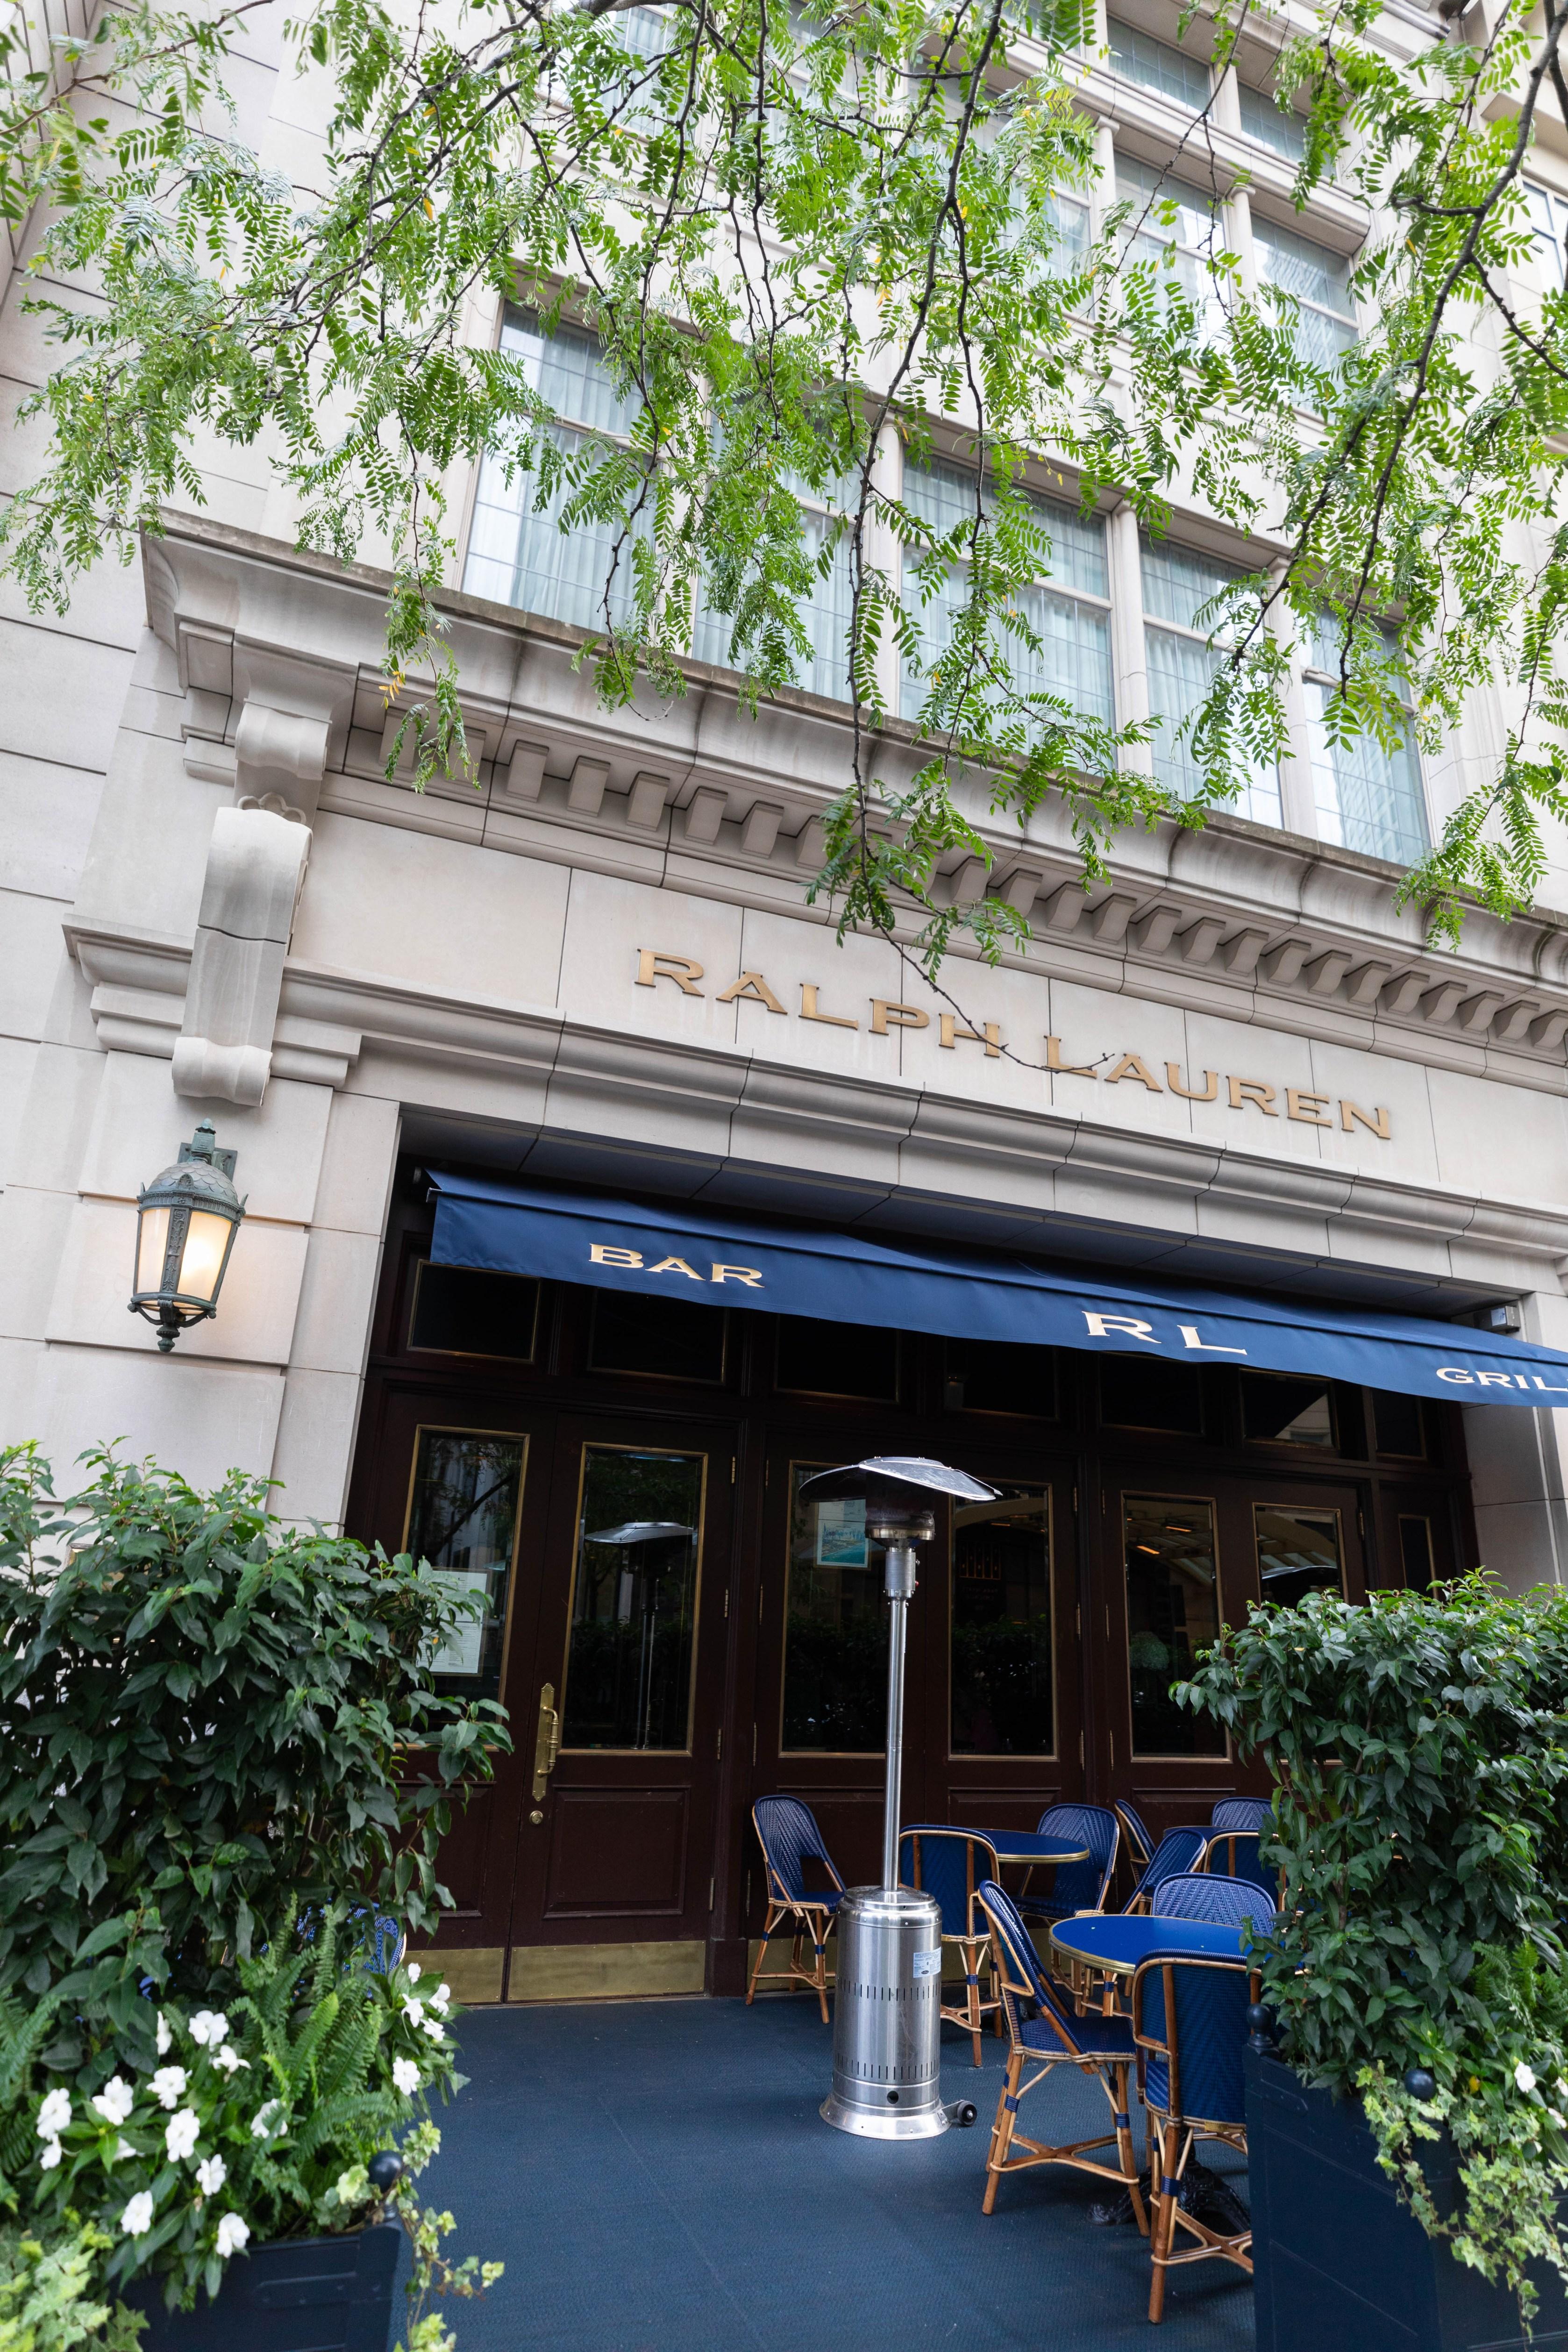 RL Ralph Lauren Restaurant Chicago Flagship Eatery Luxury Restaurants of the World Best Places to Eat in Chicago by Annie Fairfax